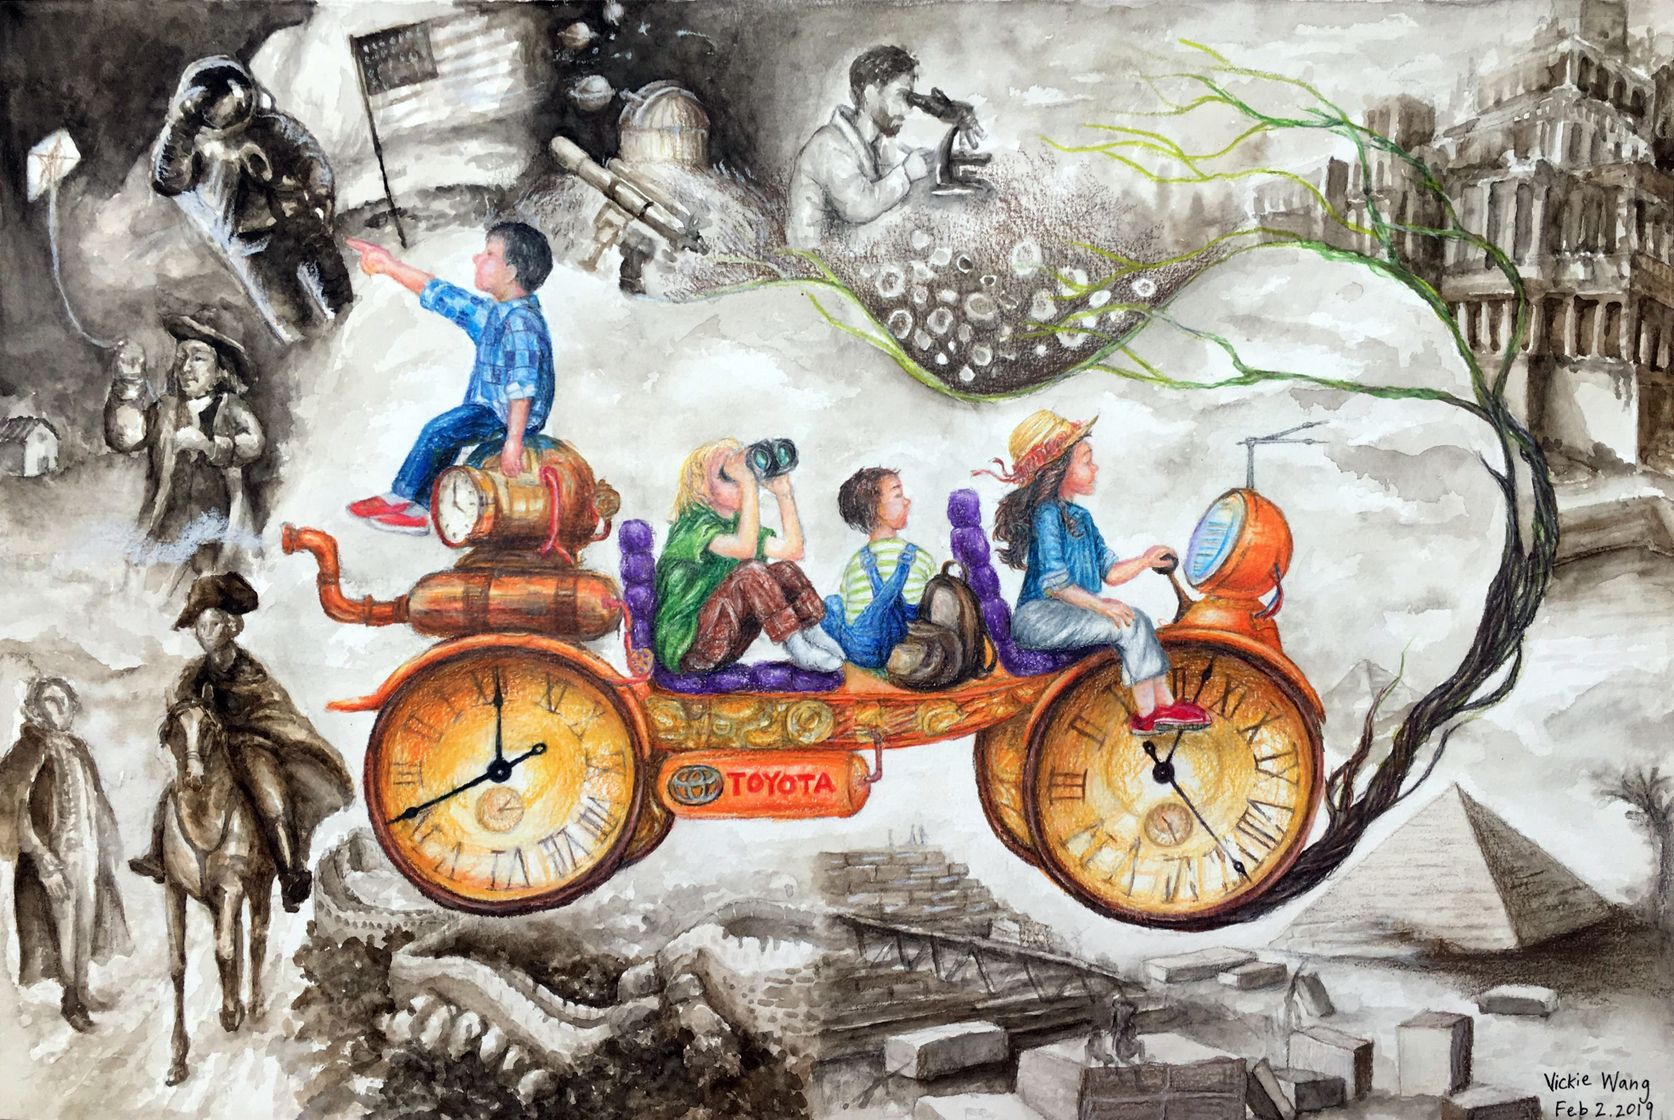 Time Traveller - Vickie Wang